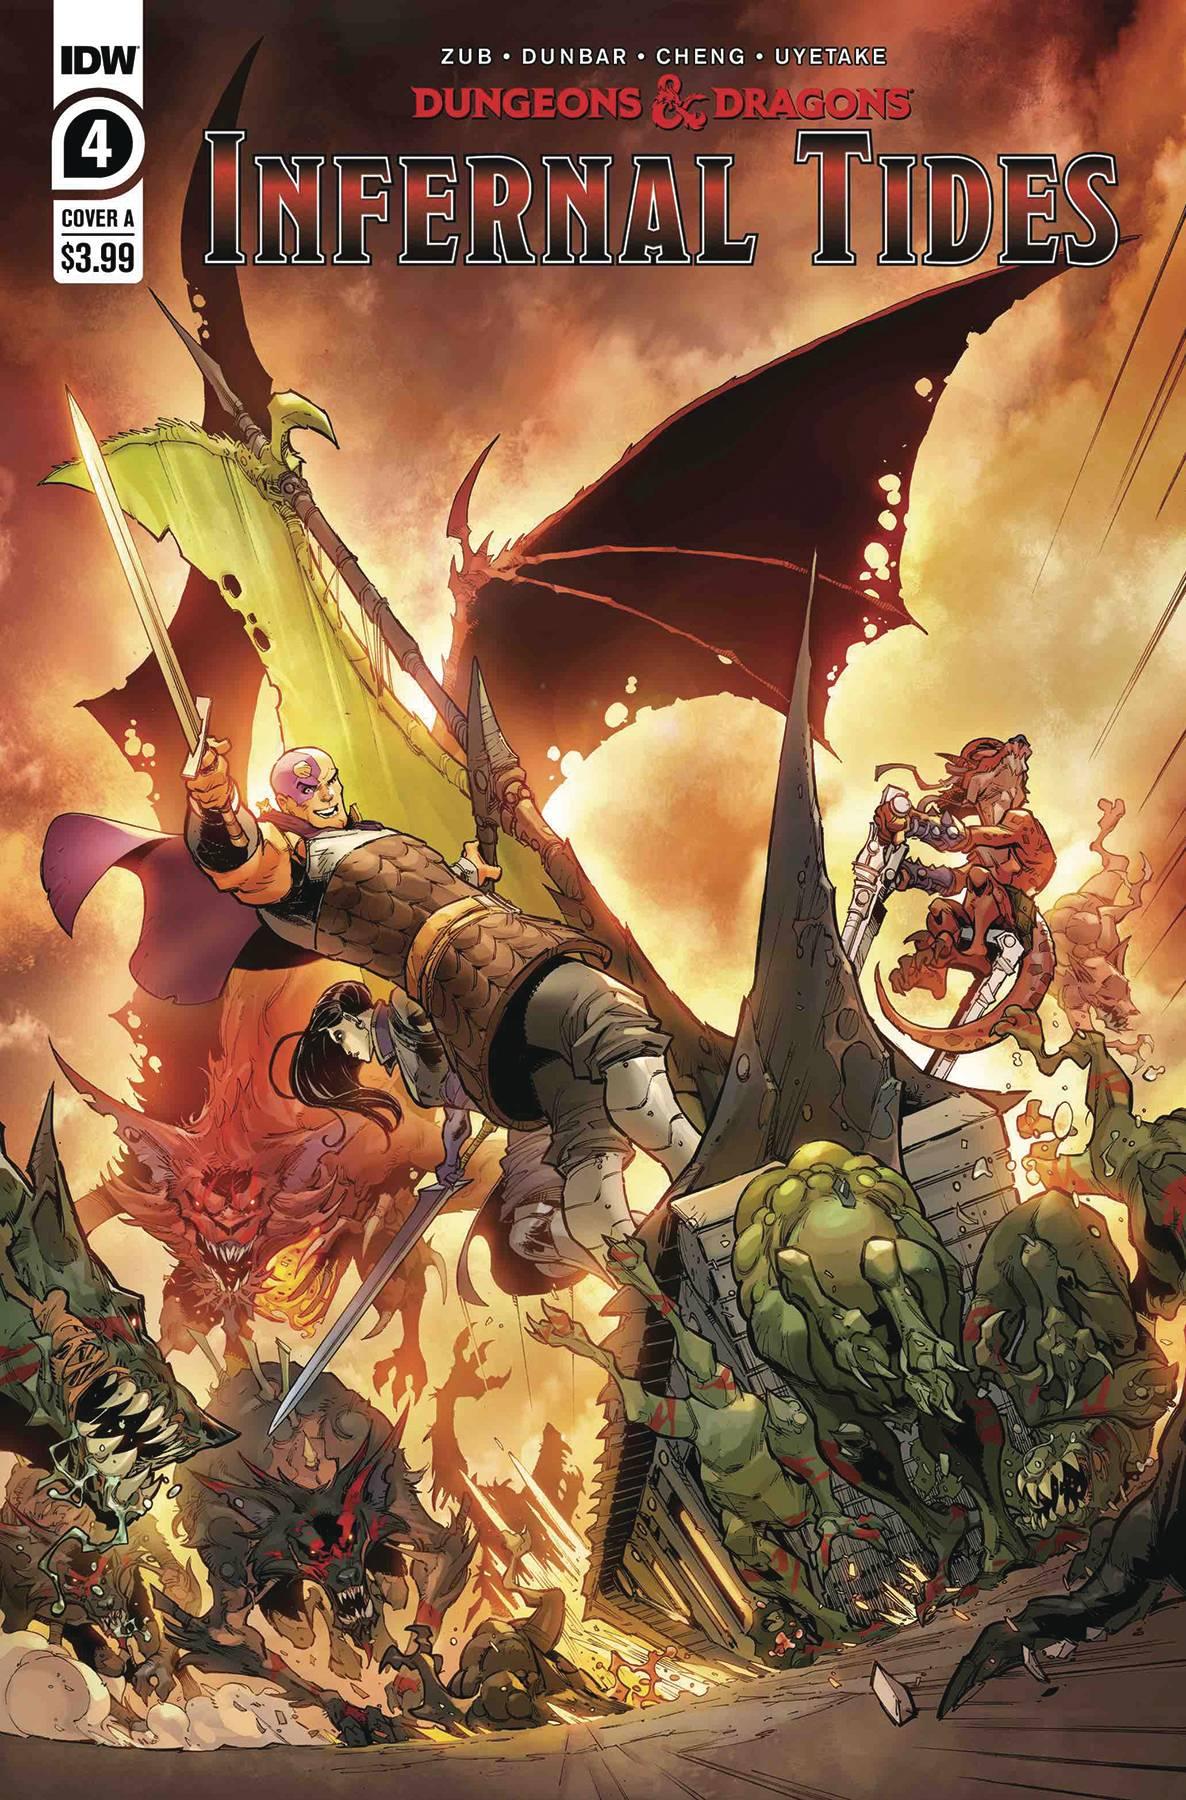 Dungeons & Dragons Infernal Tides #4